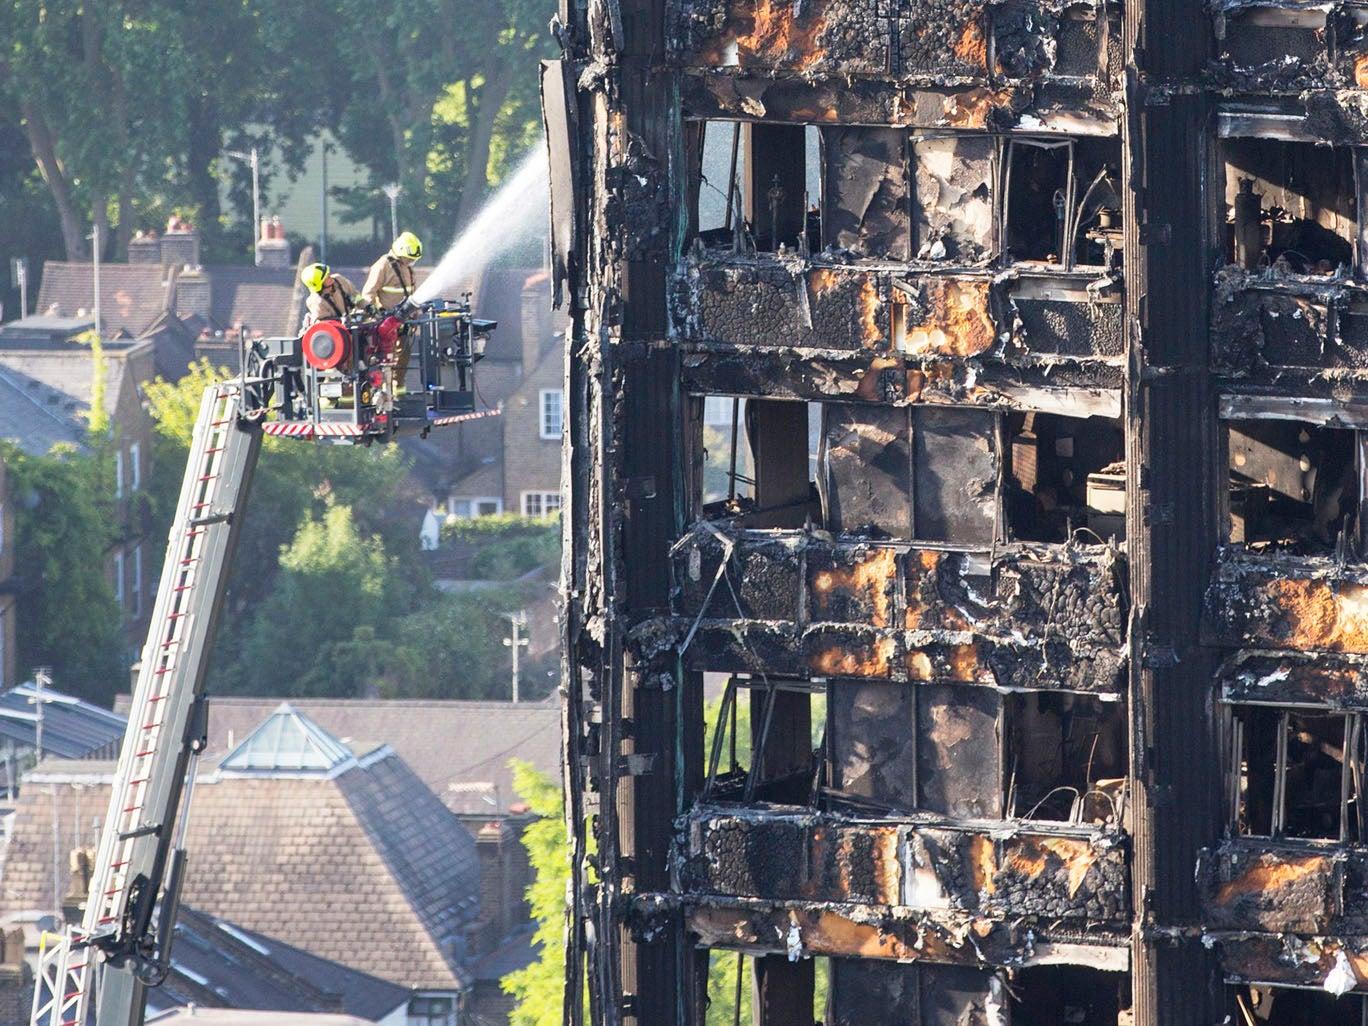 30 people confirmed dead in London tower block disaster